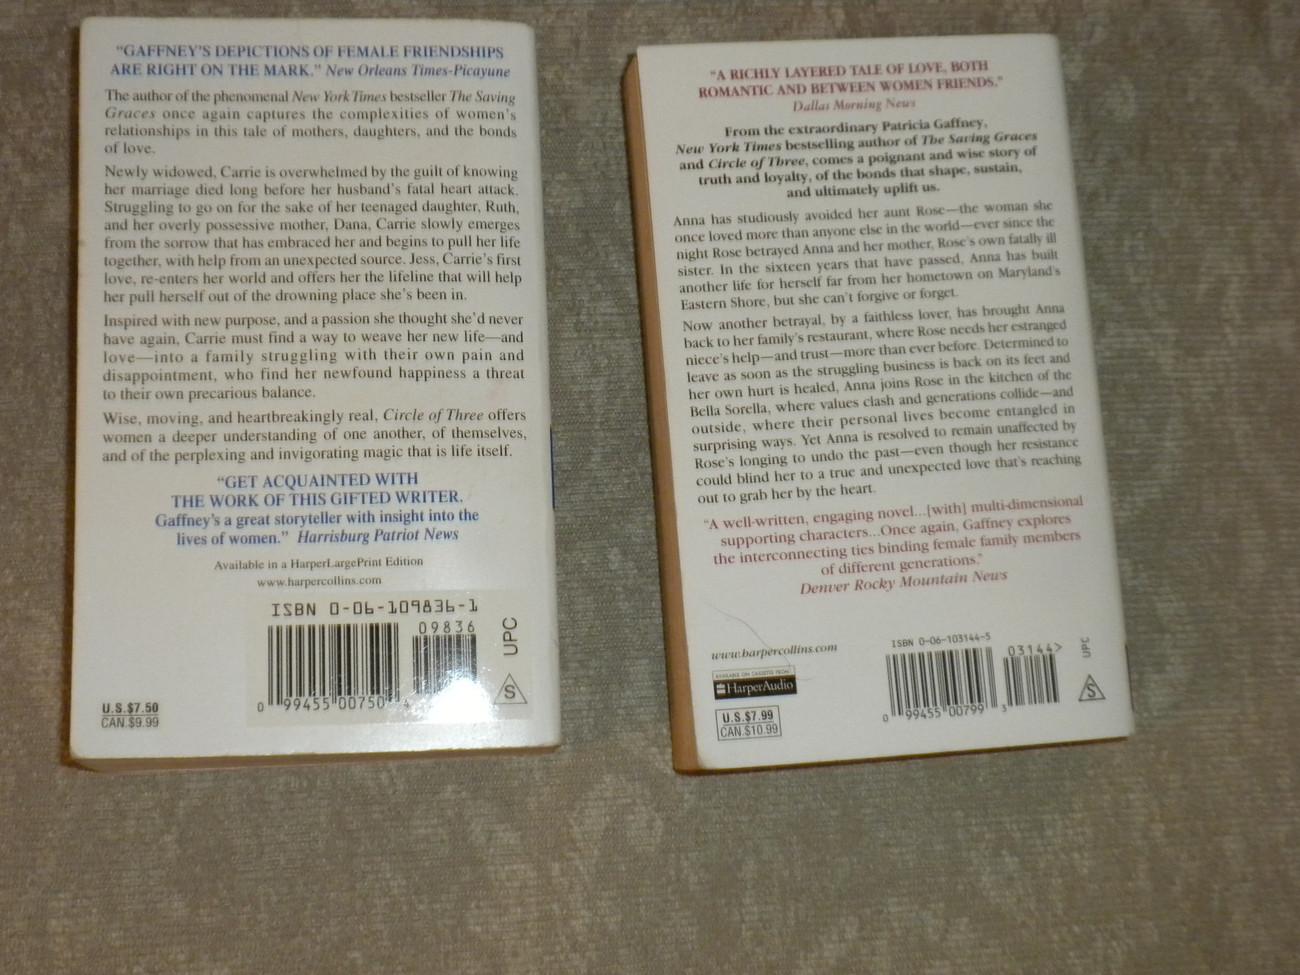 Lot of 2 Patricia Gaffney p'backs: Flight Lessons 1st 2003 & Circle of Three 1st